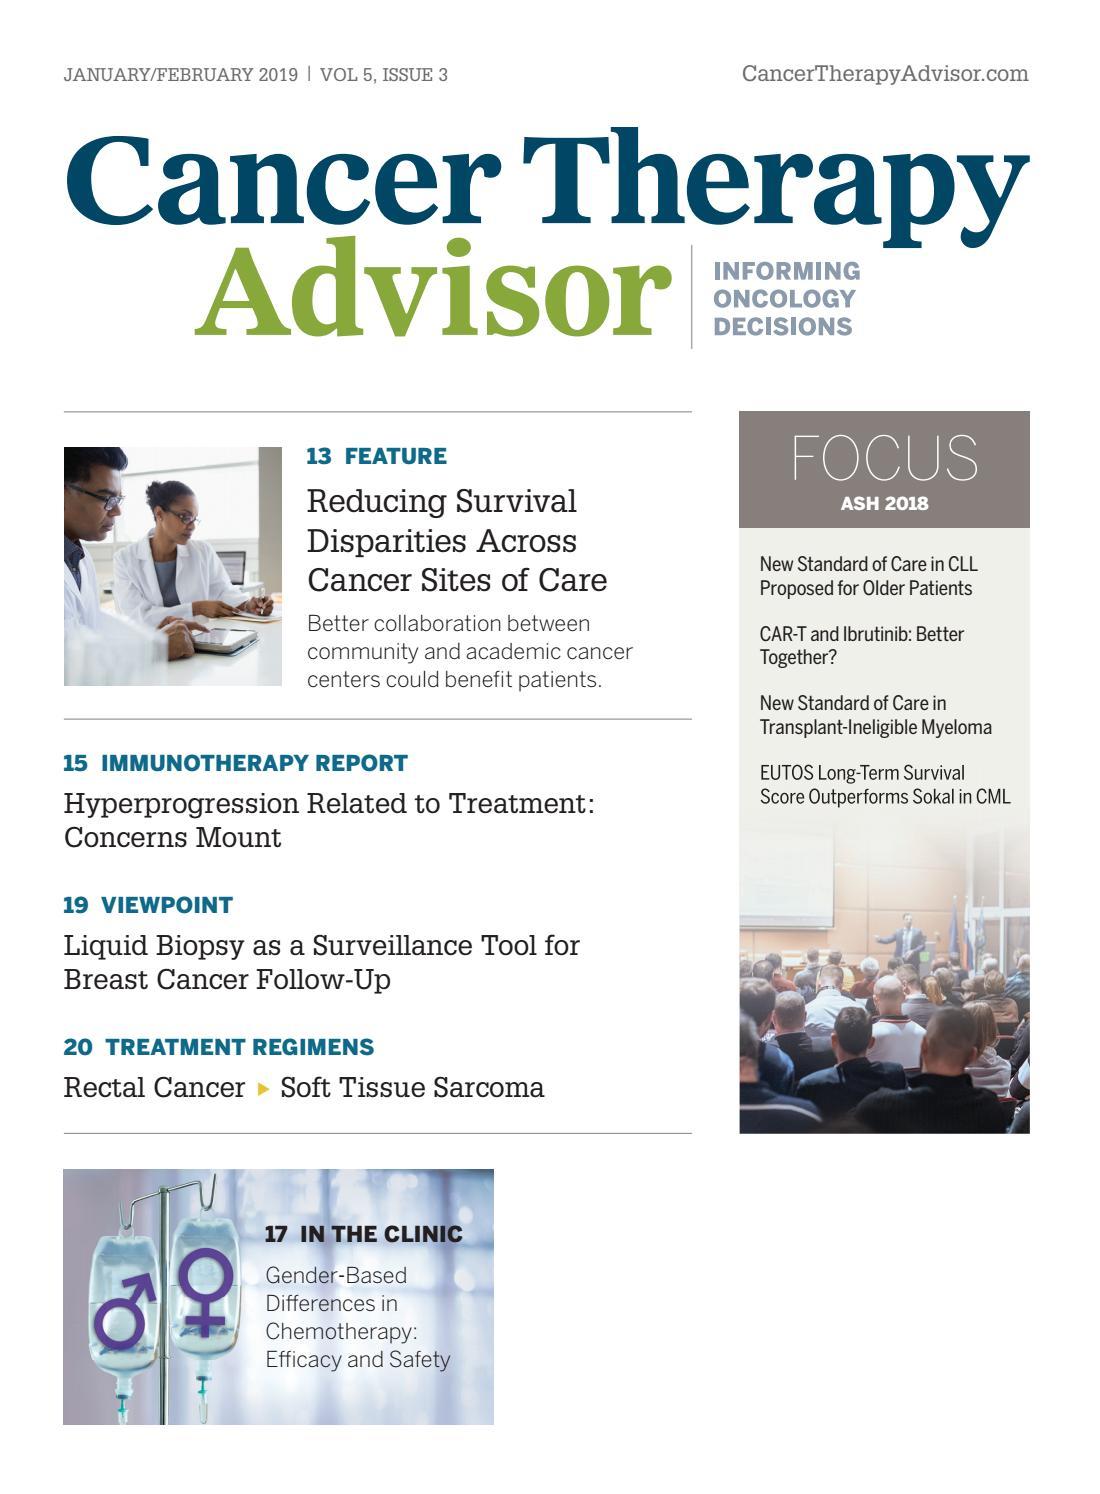 sarcoma cancer treatment centers)